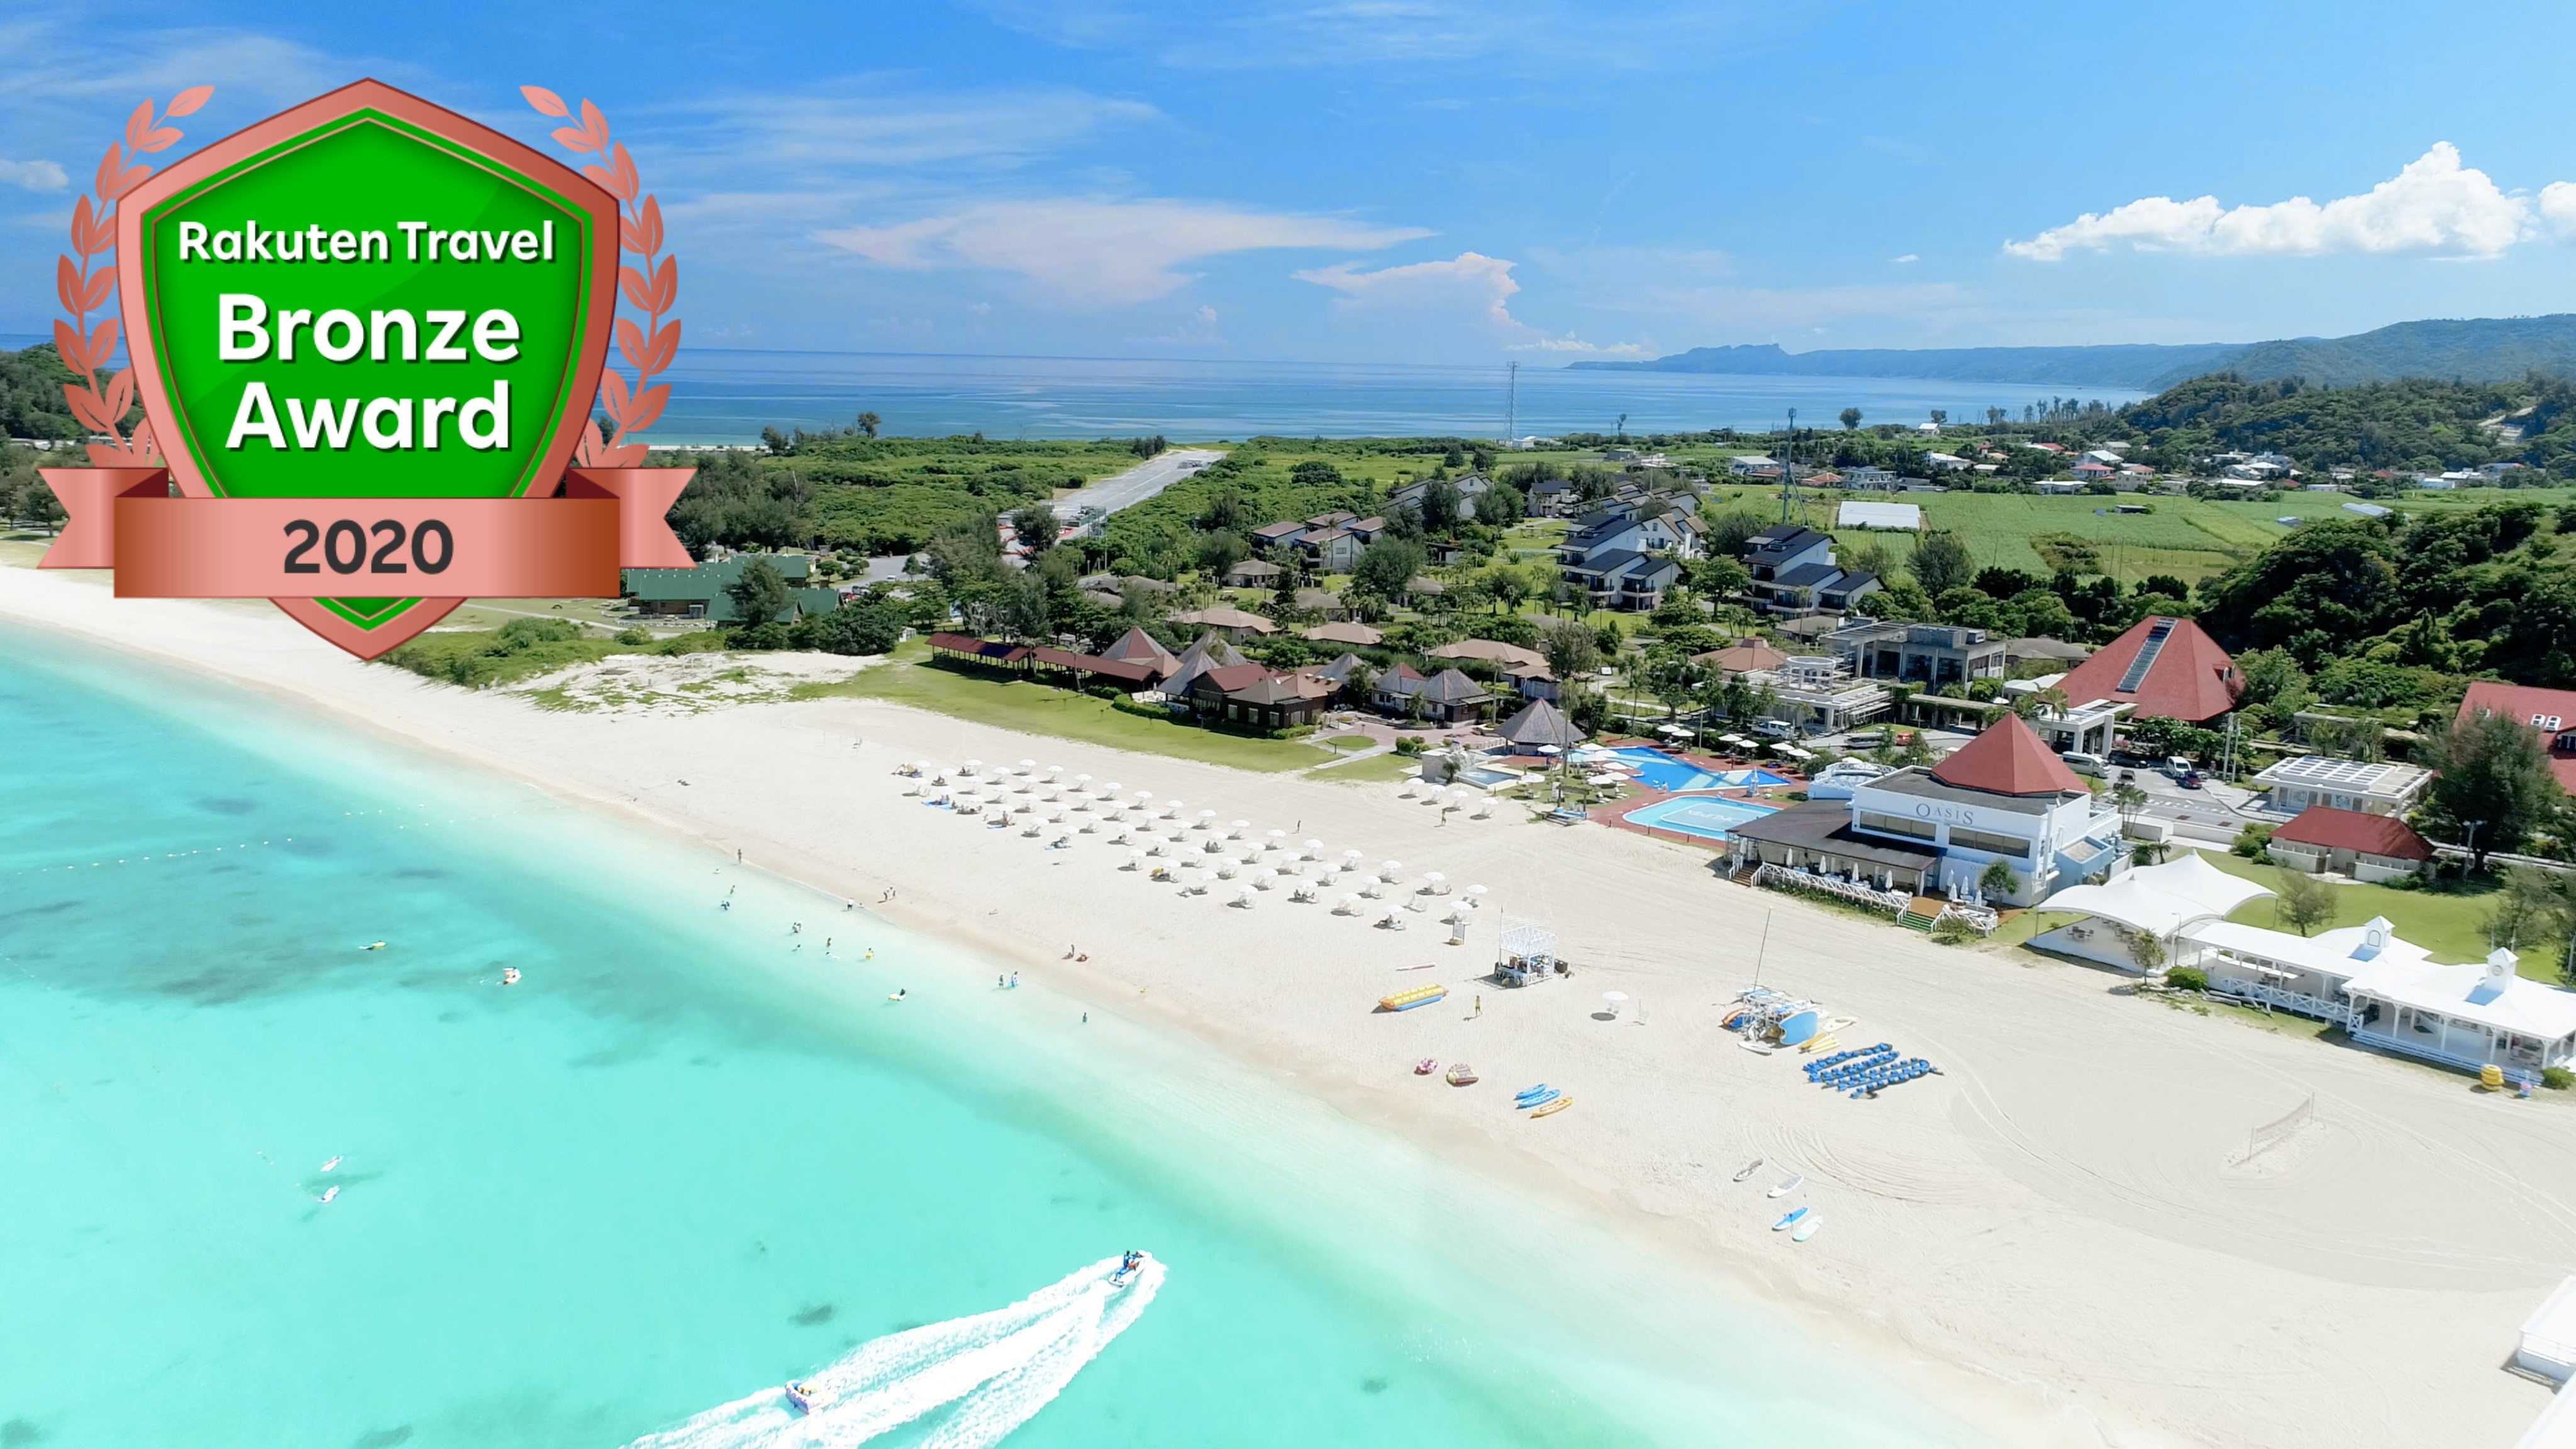 JALプライベートリゾートオクマ(2017年5月1日より:オクマ プライベートビーチ & リゾート)